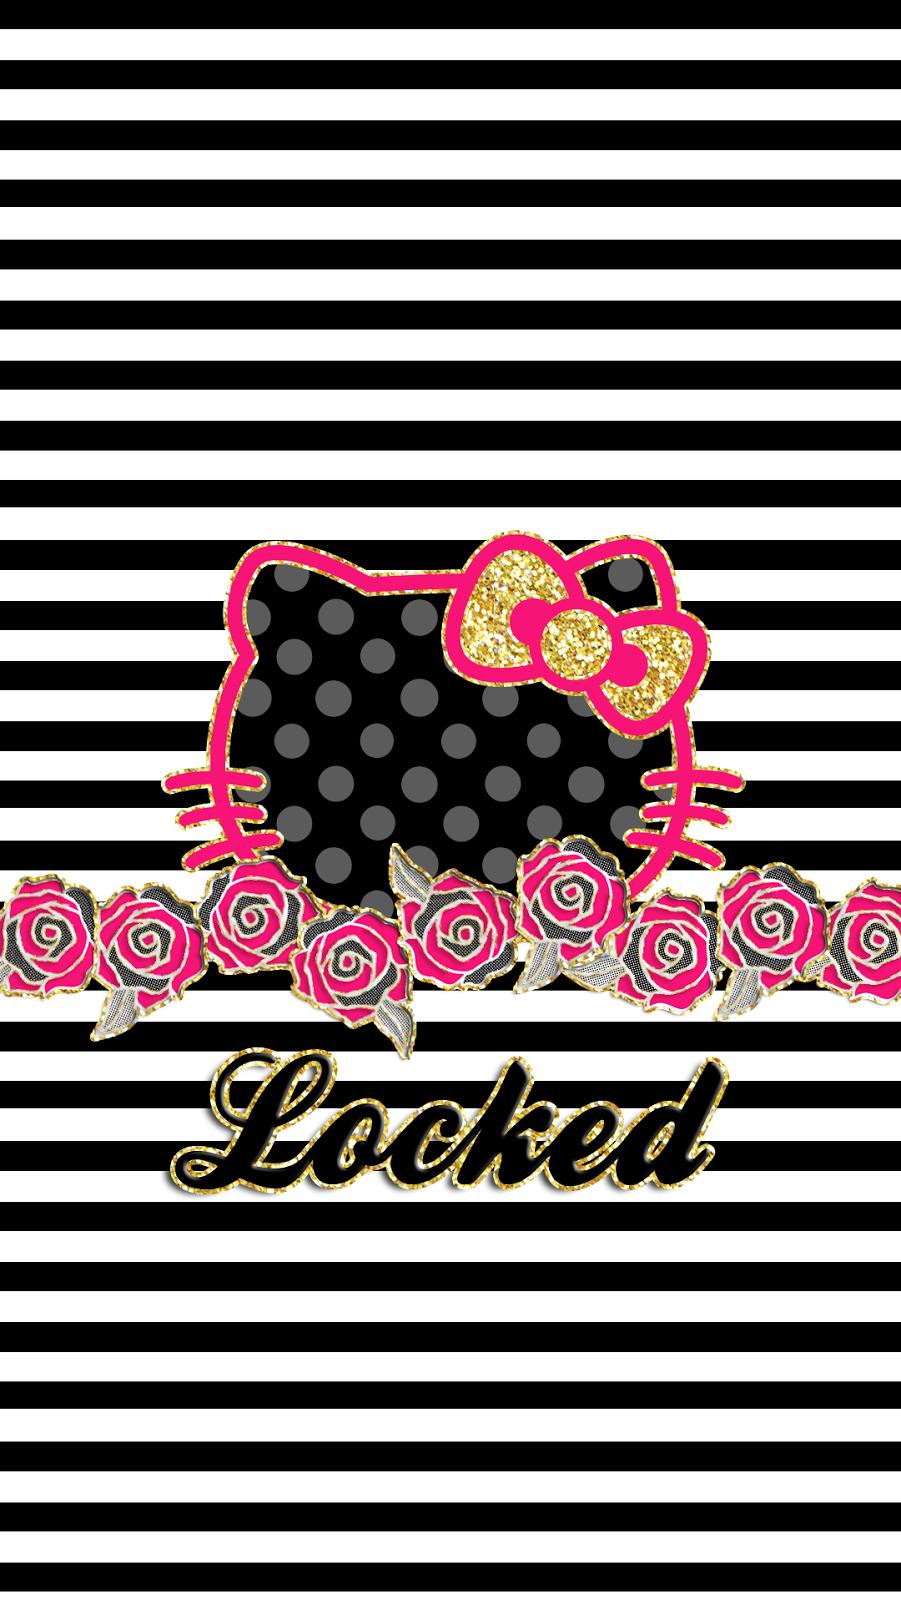 Simple Wallpaper Hello Kitty Cheetah - 3ddc8979f5ea415e65142d5e640ca962  2018_95839.png